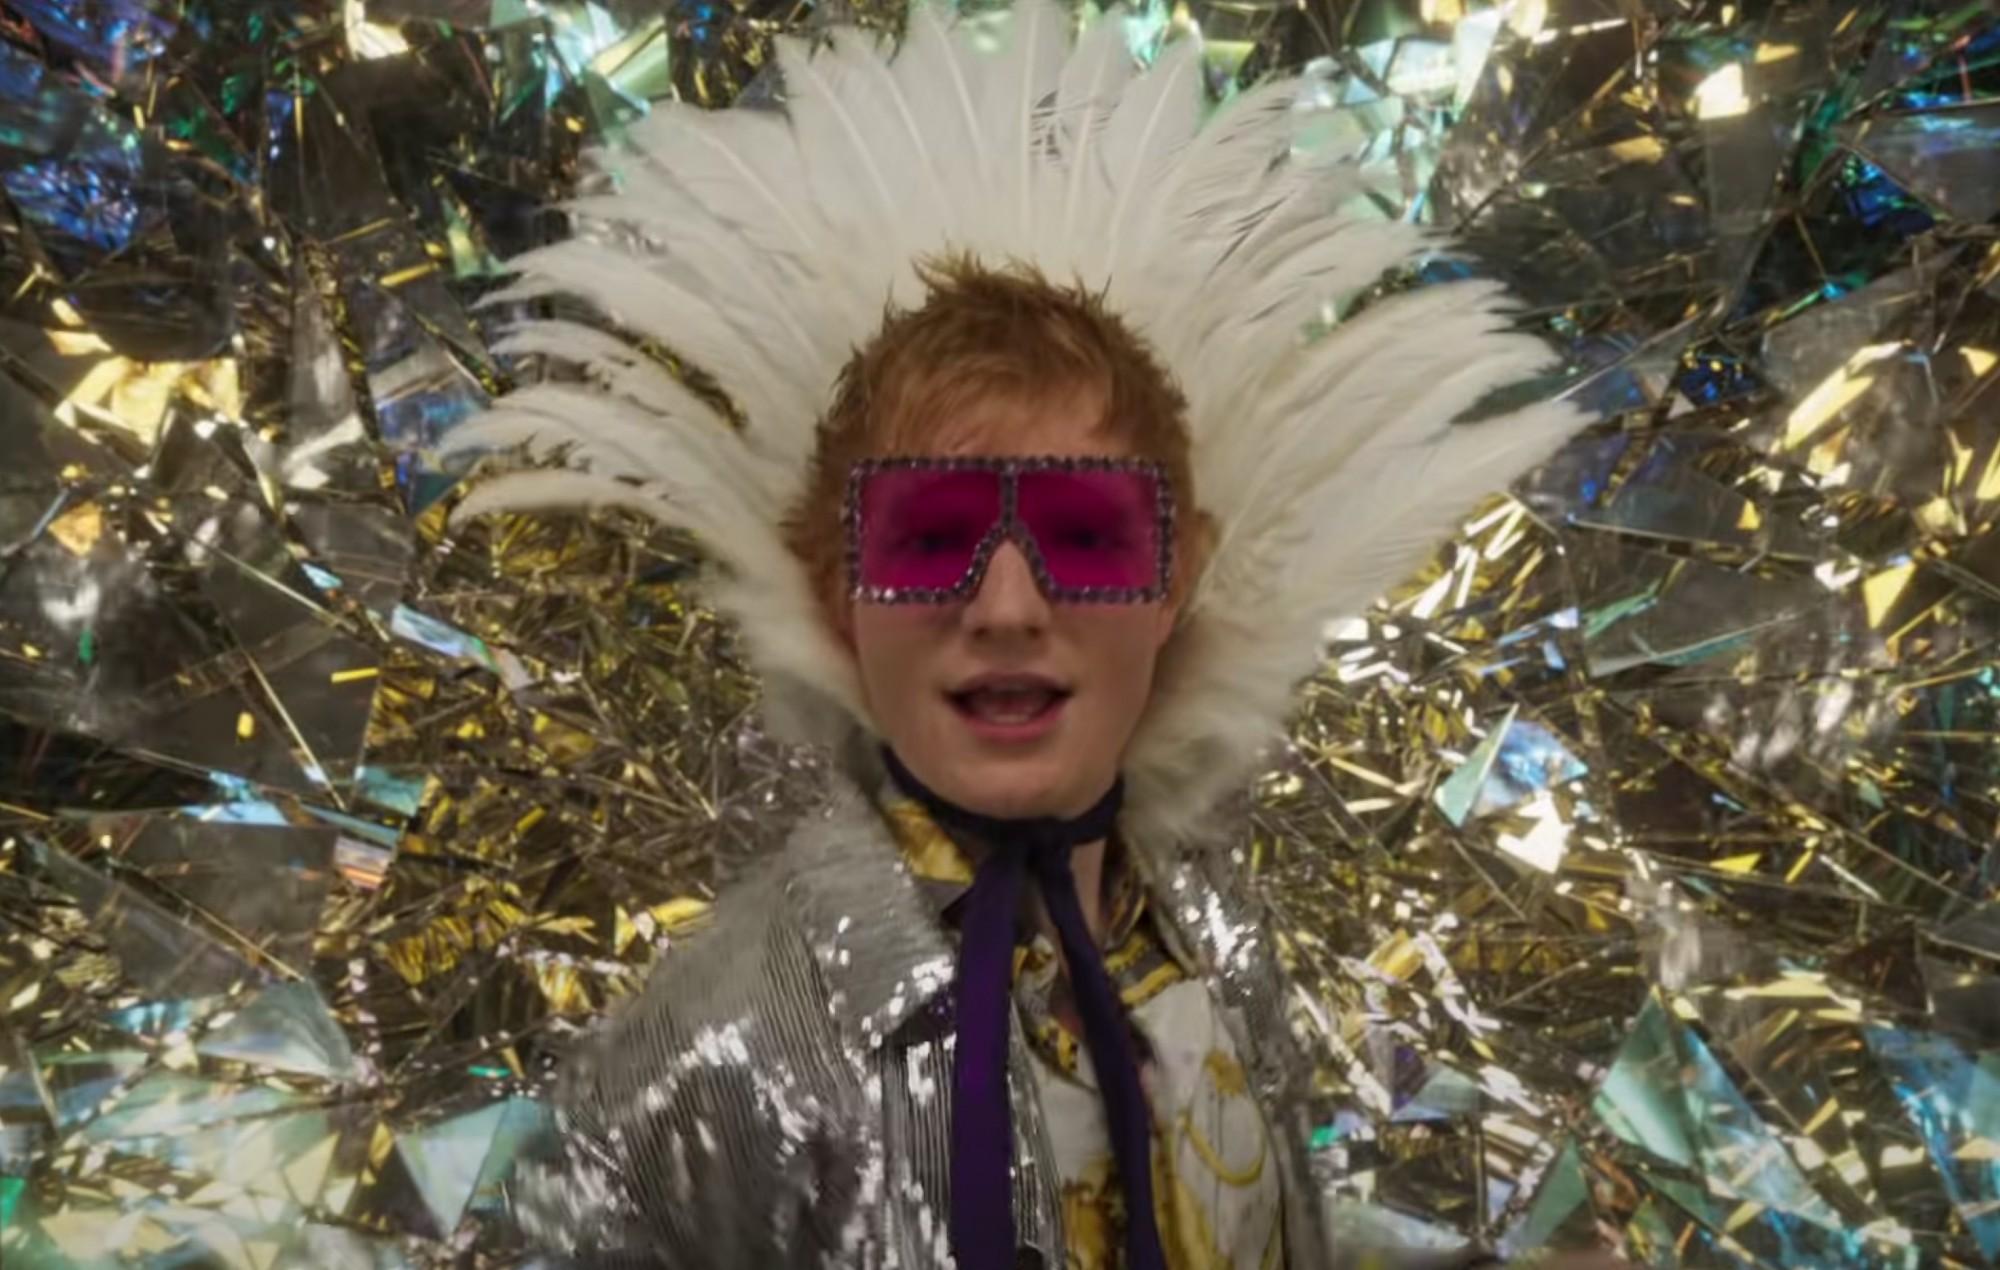 ed-sheeran-shivers-music video 2021